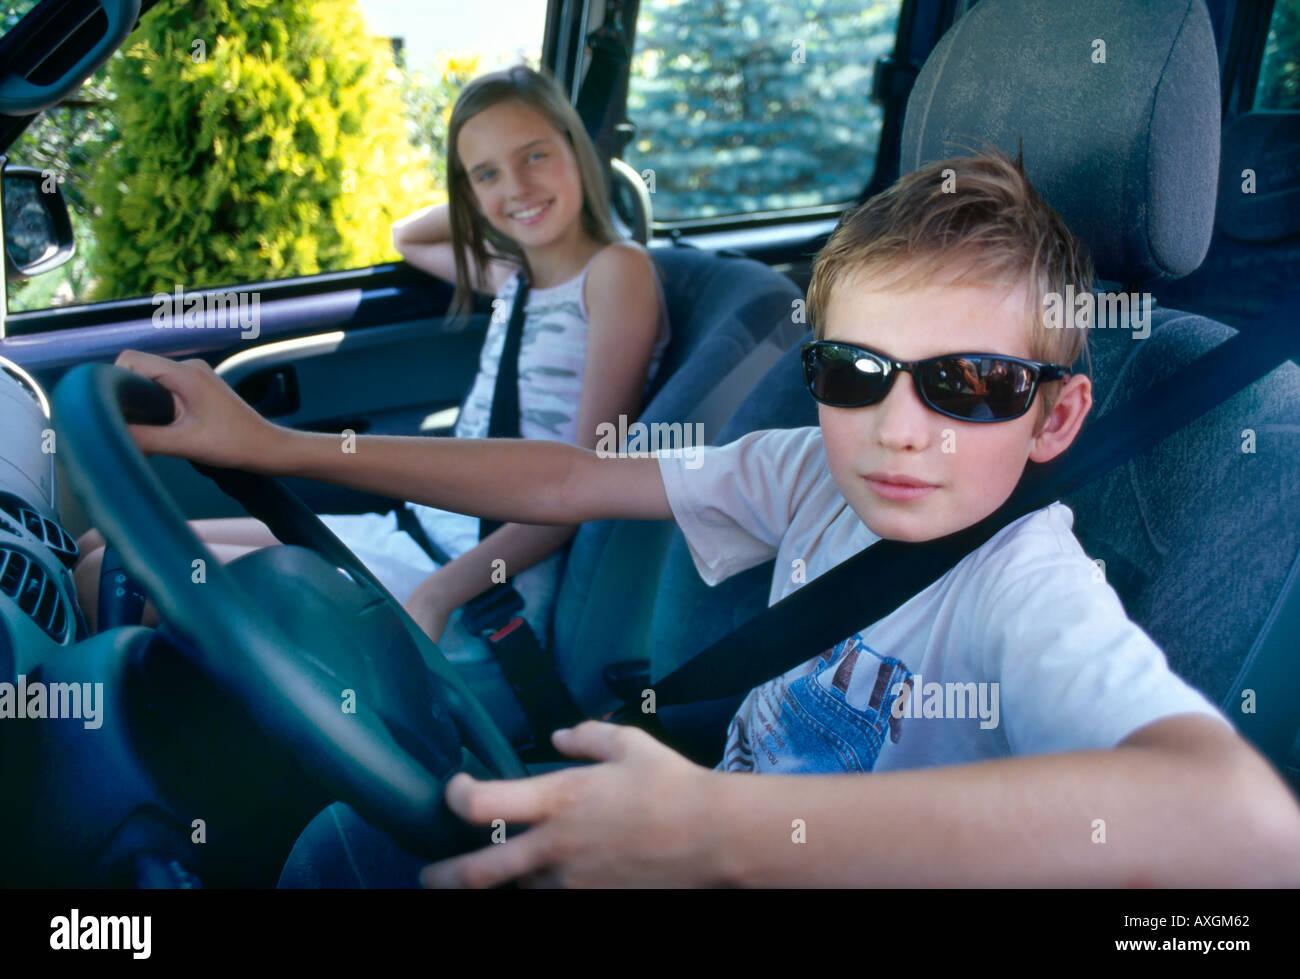 Indoor Car Day Girl Teenager Brunette Long Hair Child Boy Blonde Sister  Brother 10 15 5 10 Sunglasses Dark Seat Belt Seat Bel